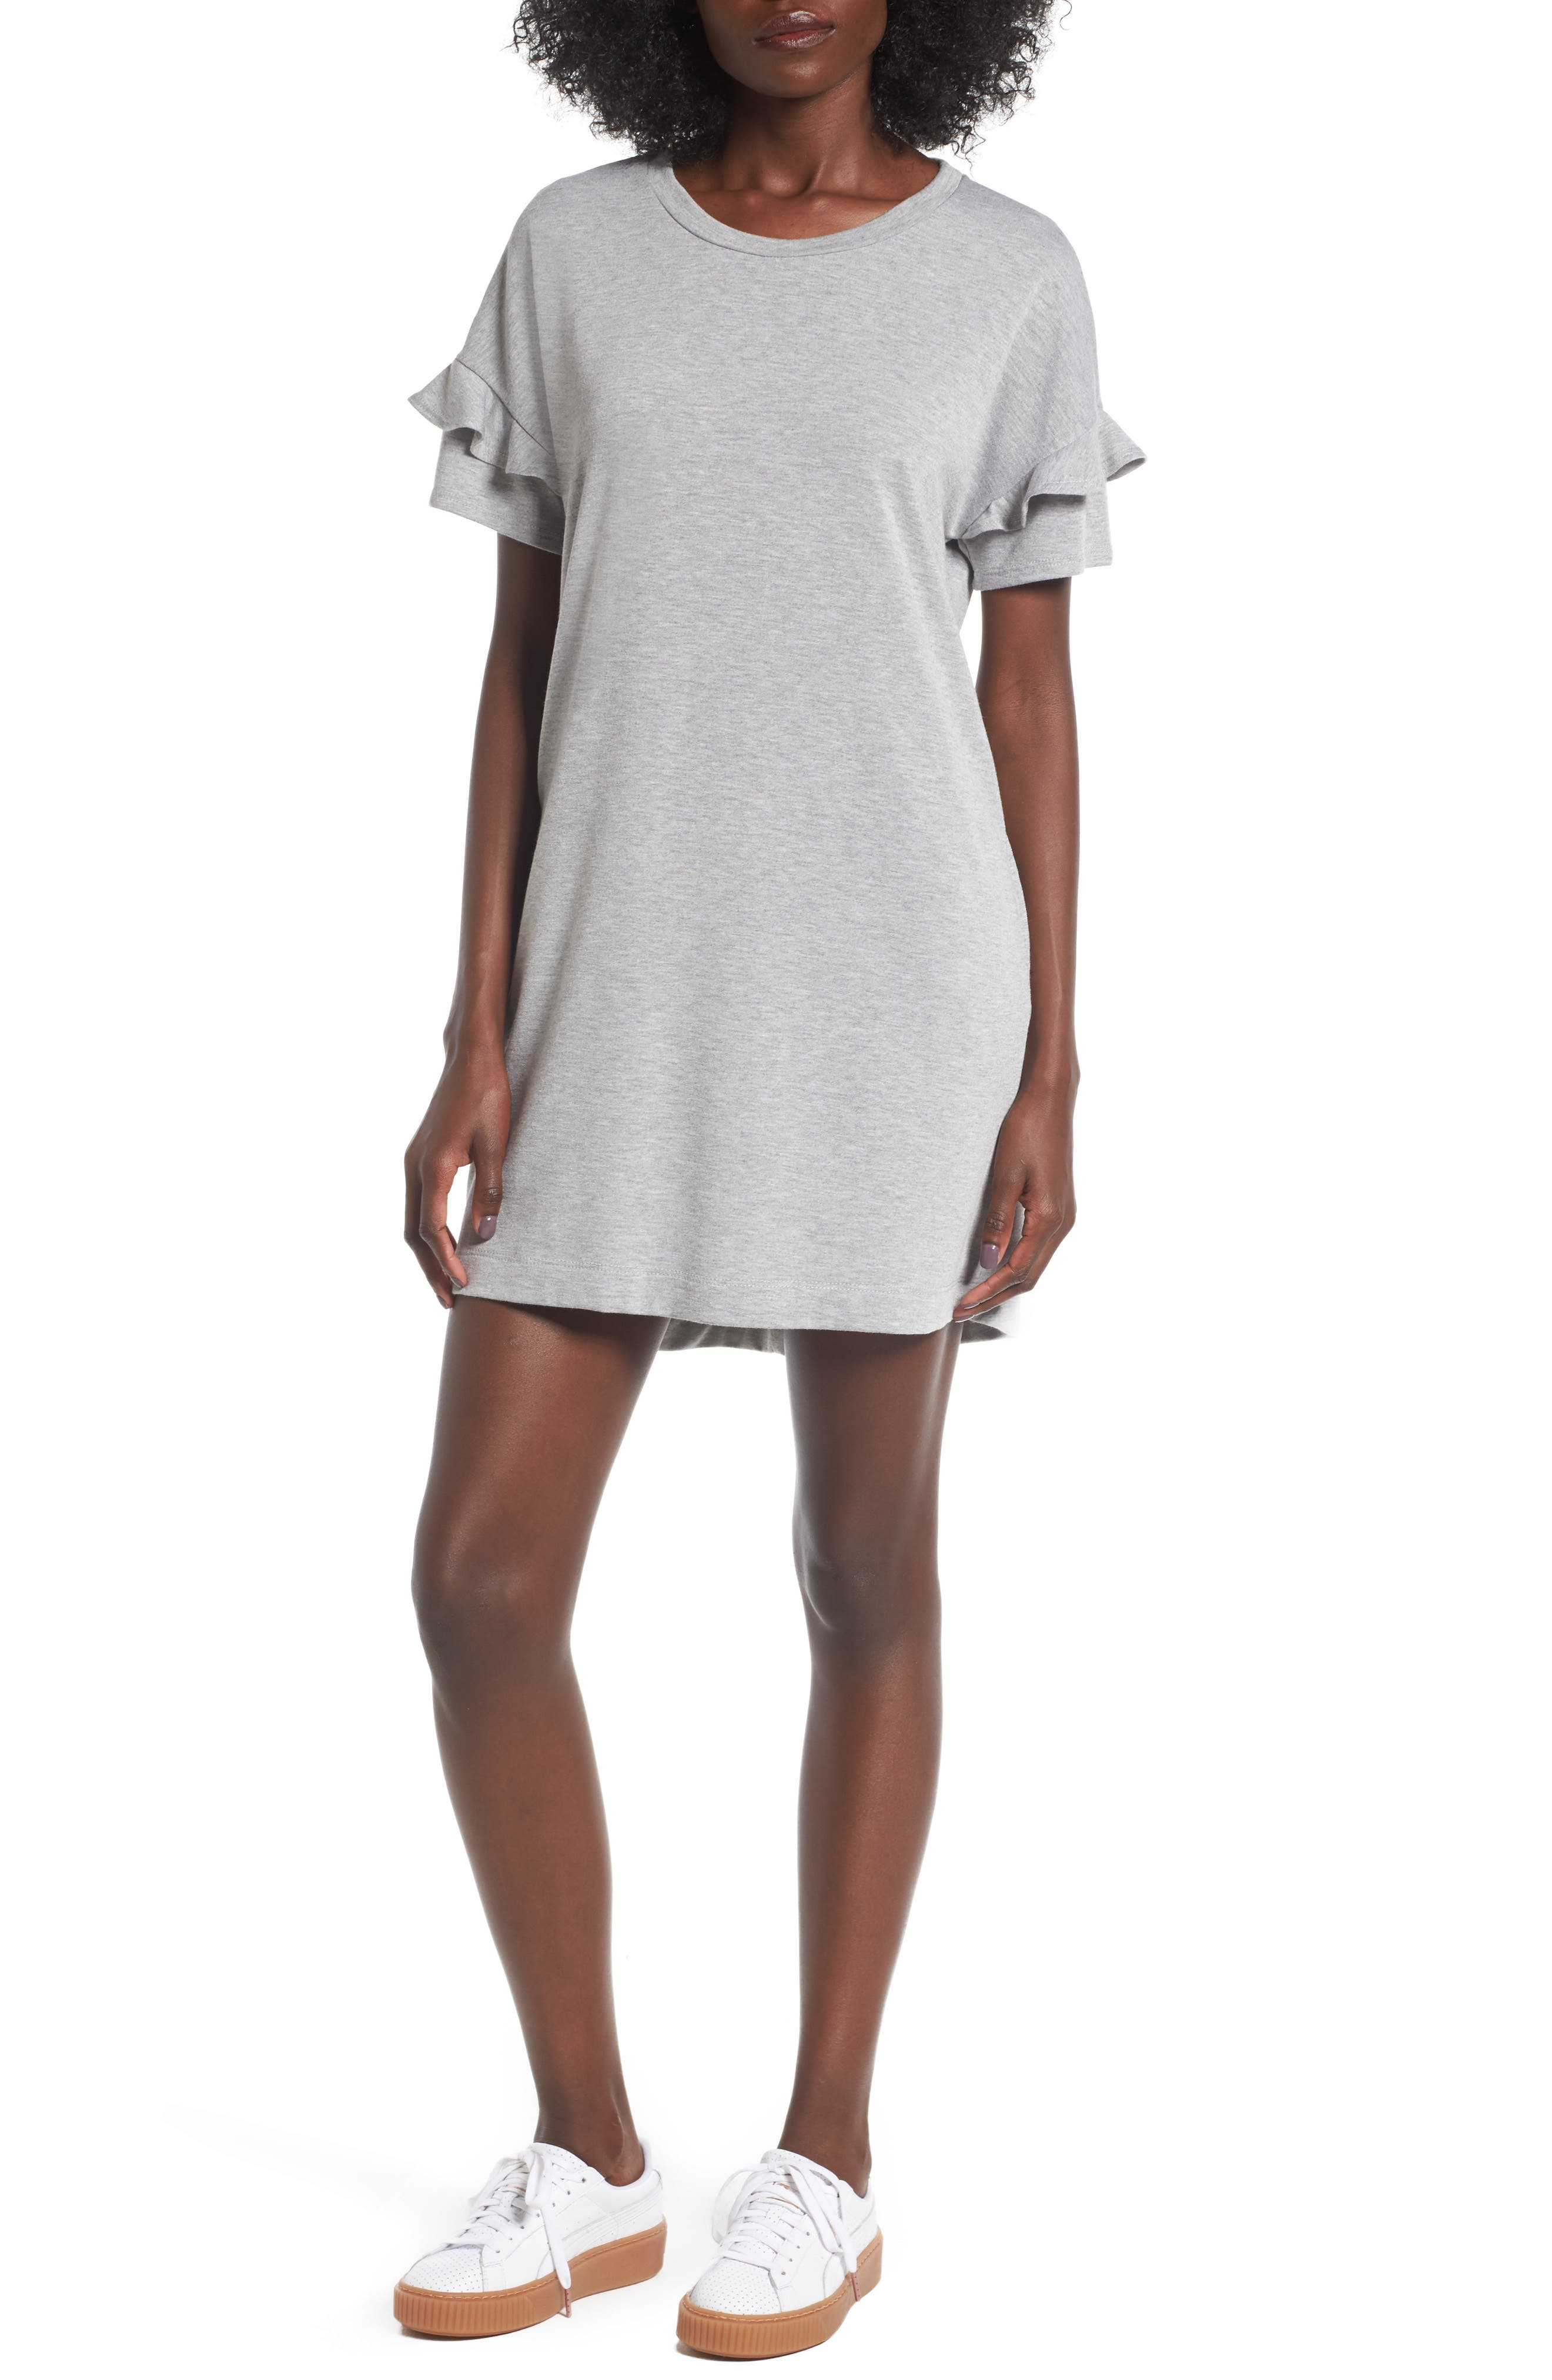 Alternate Image 1 Selected - Lush Ruffle Sleeve T-Shirt Dress